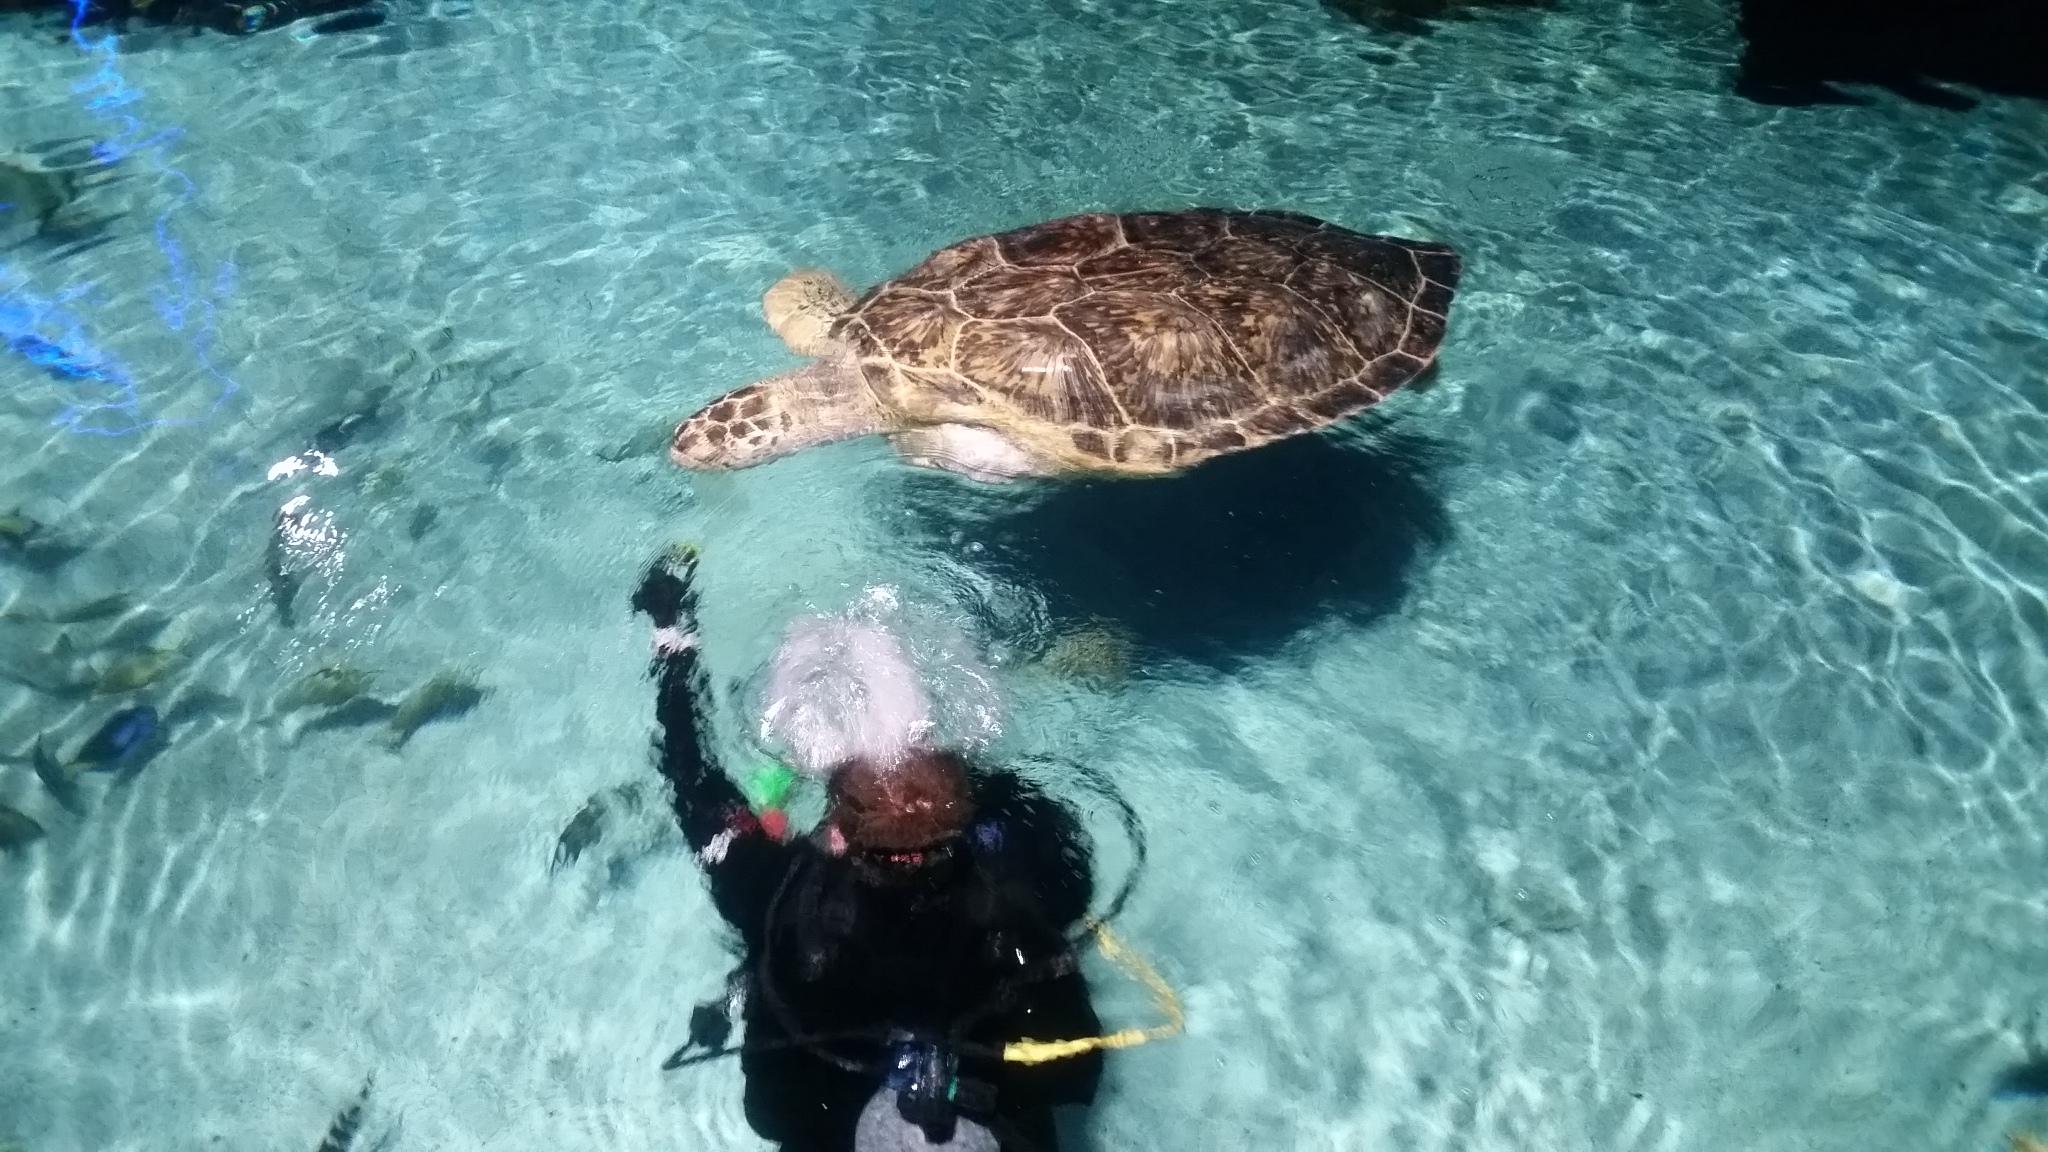 This giant turtle, Calypso, is one of the aquarium's big stars!